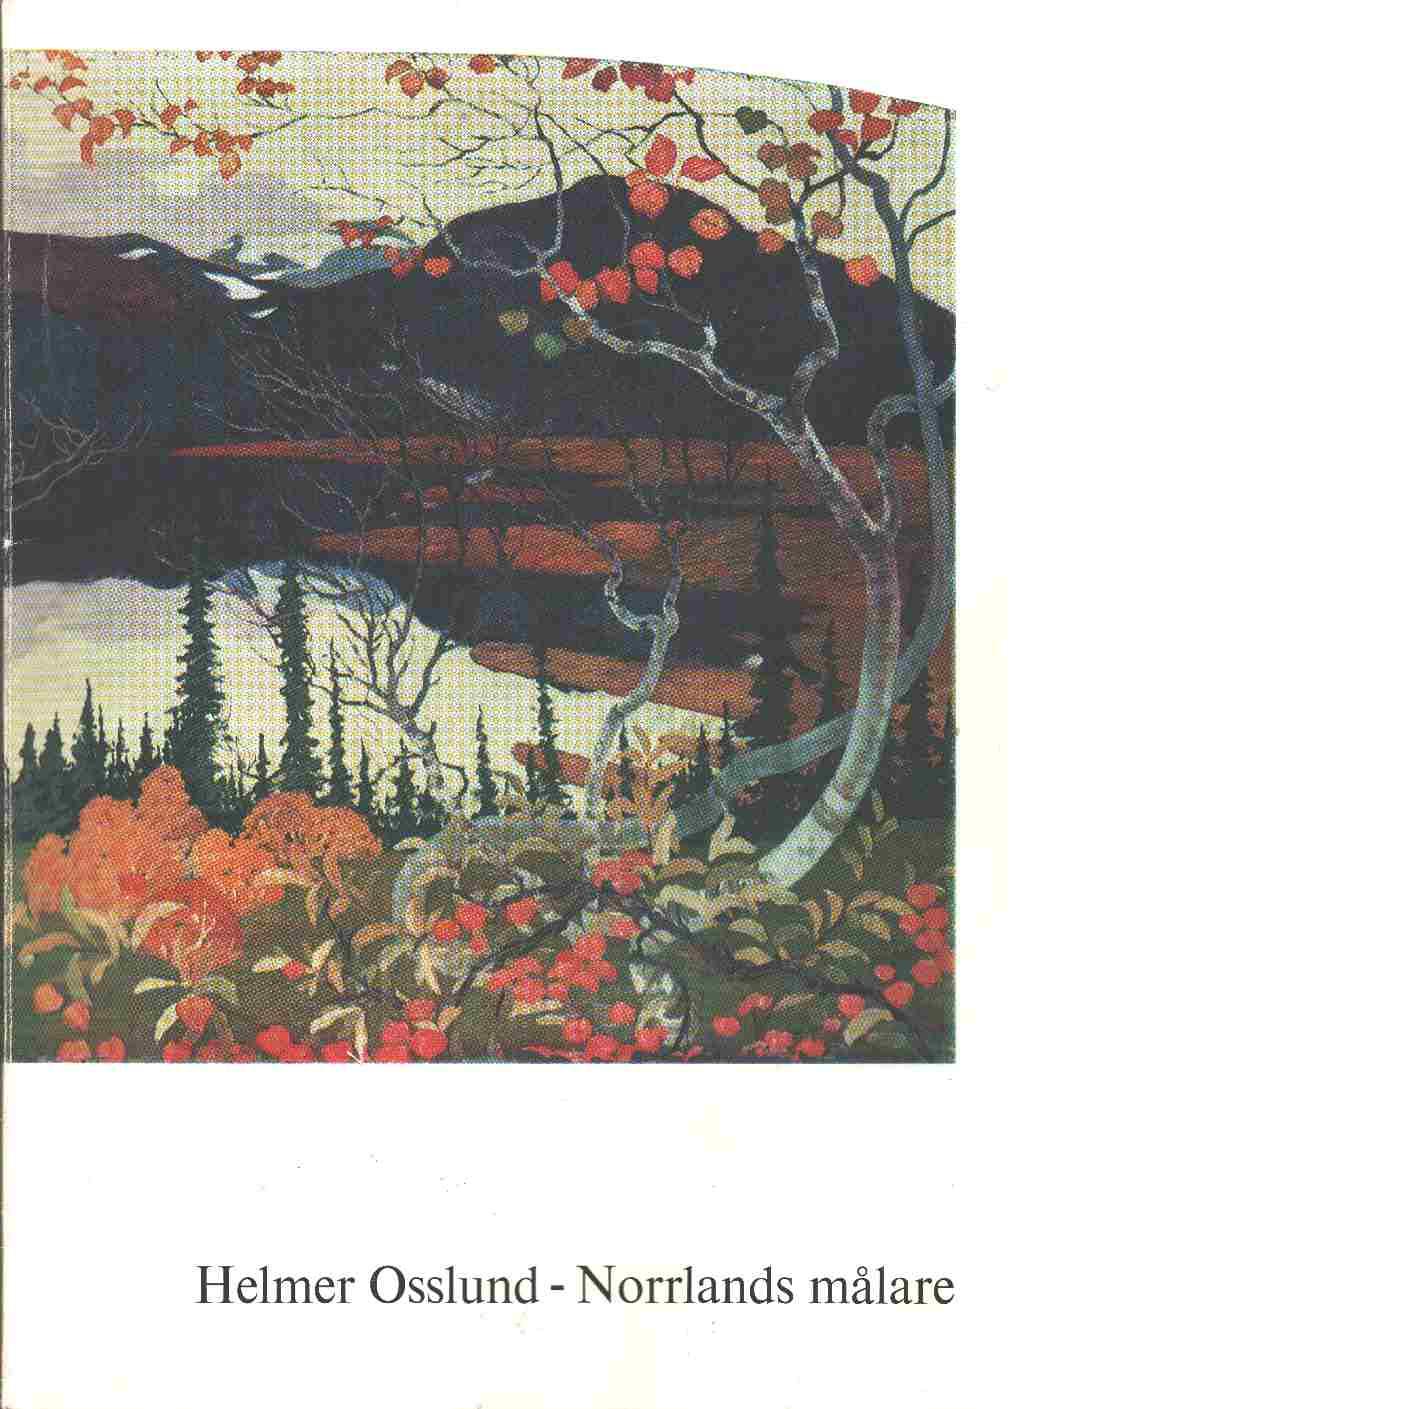 Helmer Osslund - Norrlands målare - Red. Reuterswärd, Patrik